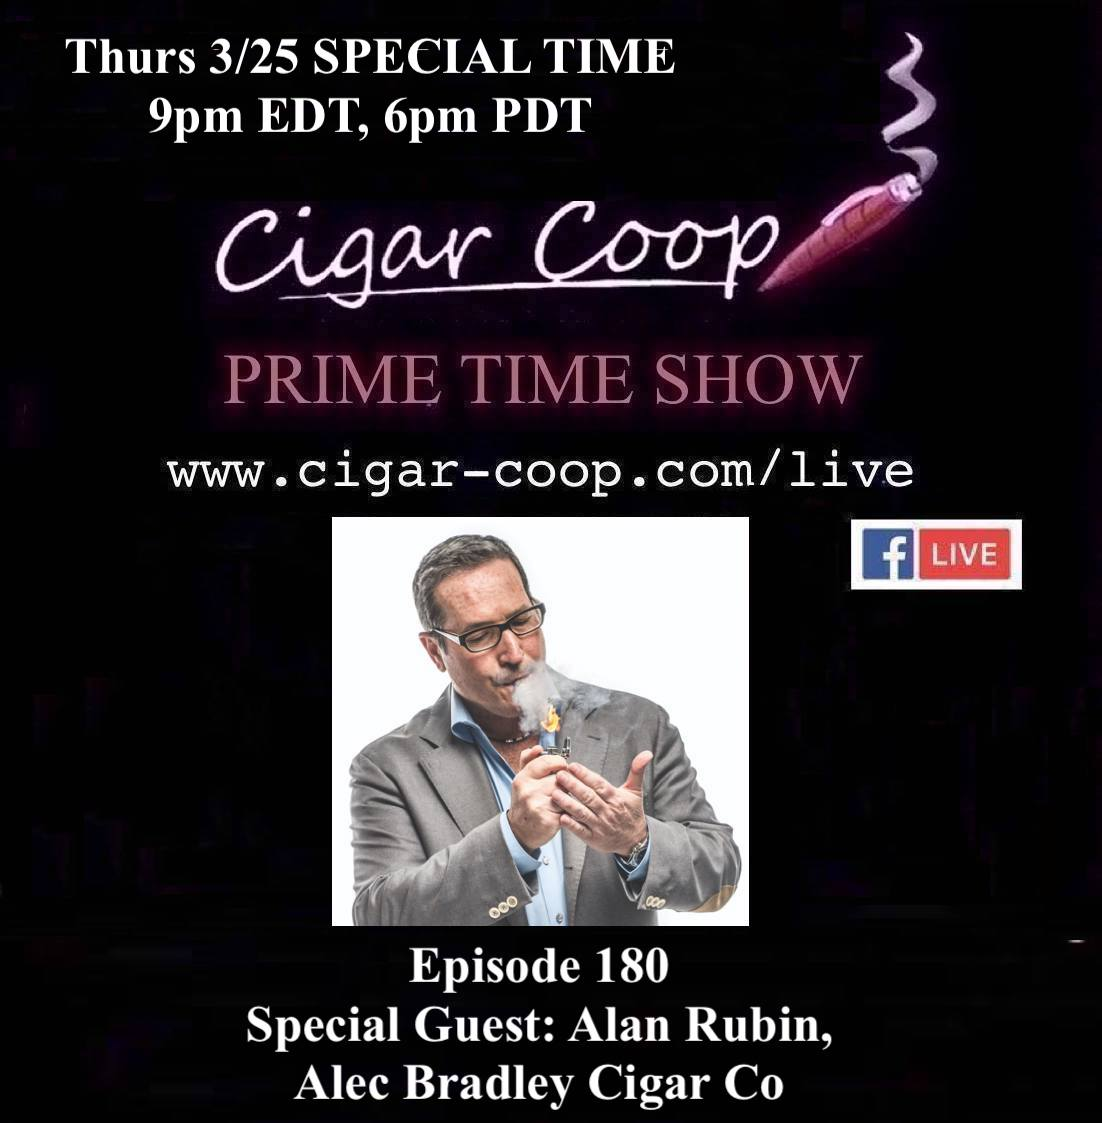 Announcement: Prime Time Episode 180 – Alan Rubin, Alec Bradley Cigar Company